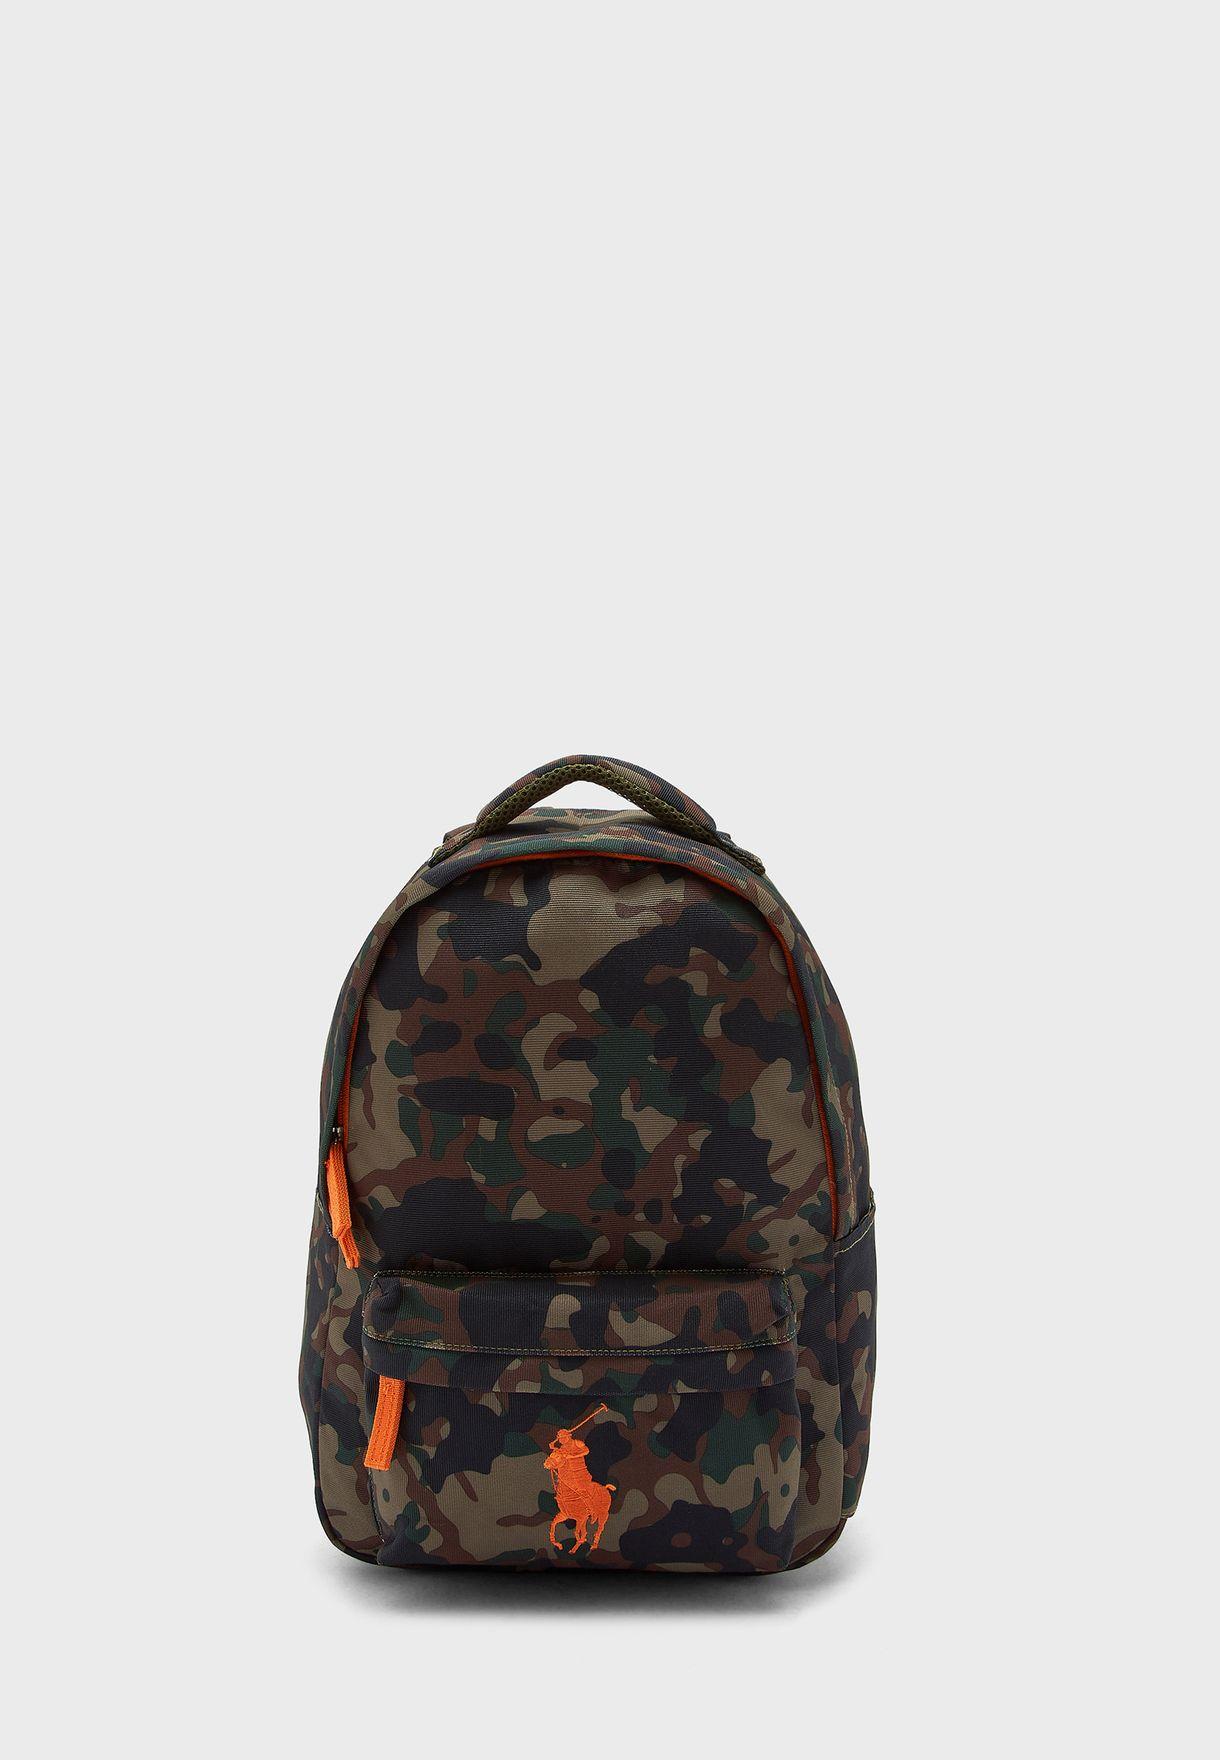 Zip Closure Outer Pocket Backpack